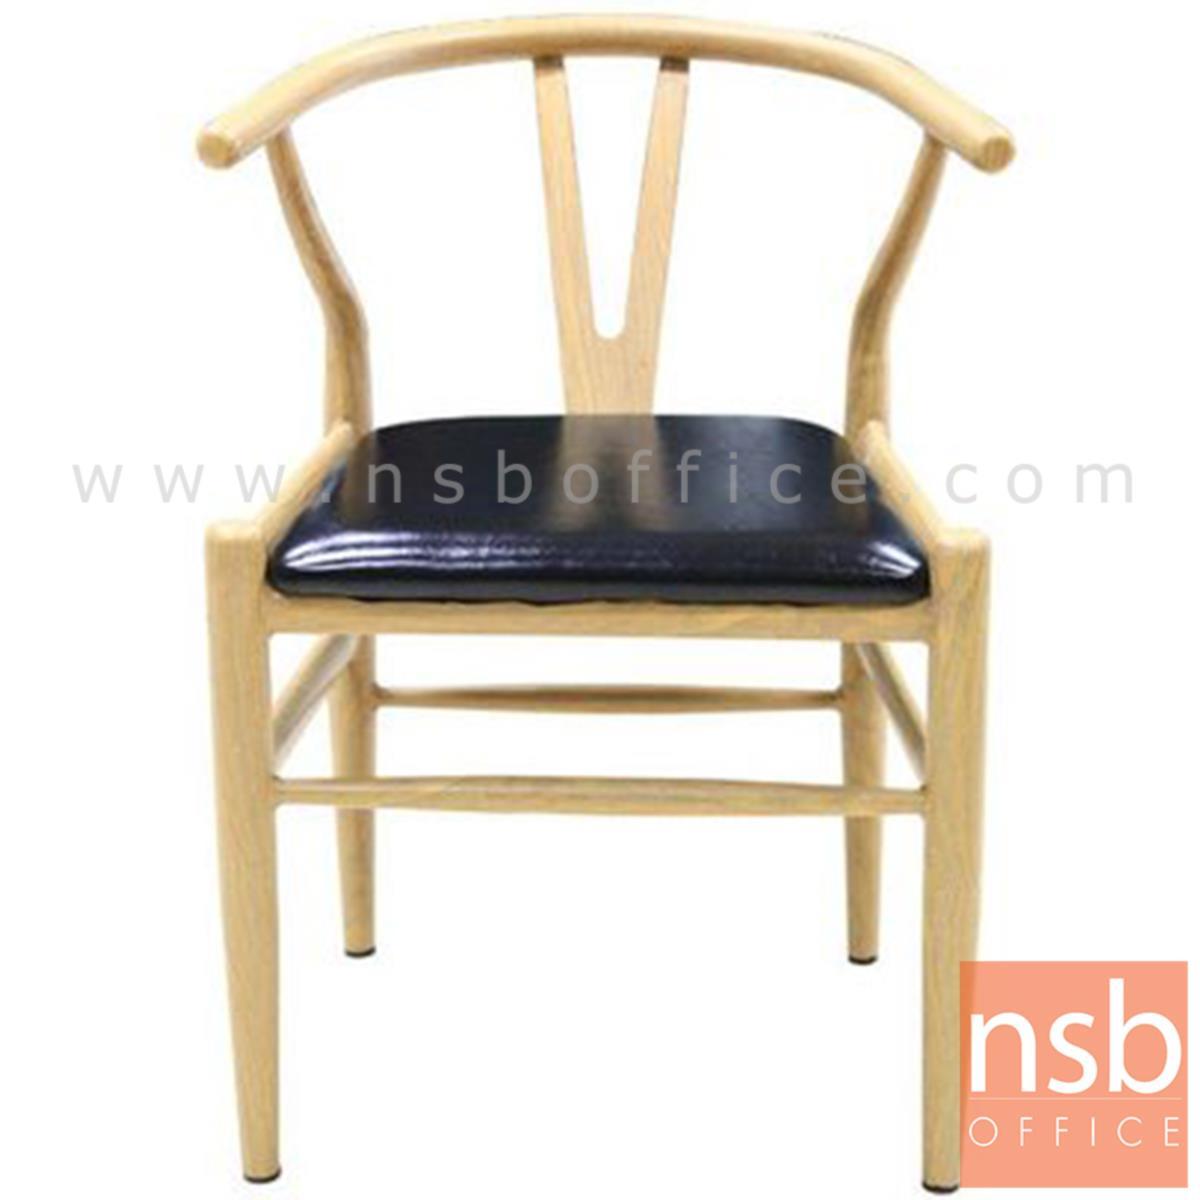 B22A176:เก้าอี้อเนกประสงค์ รุ่น MOLE (โมล) ขนาด 48.5W cm.